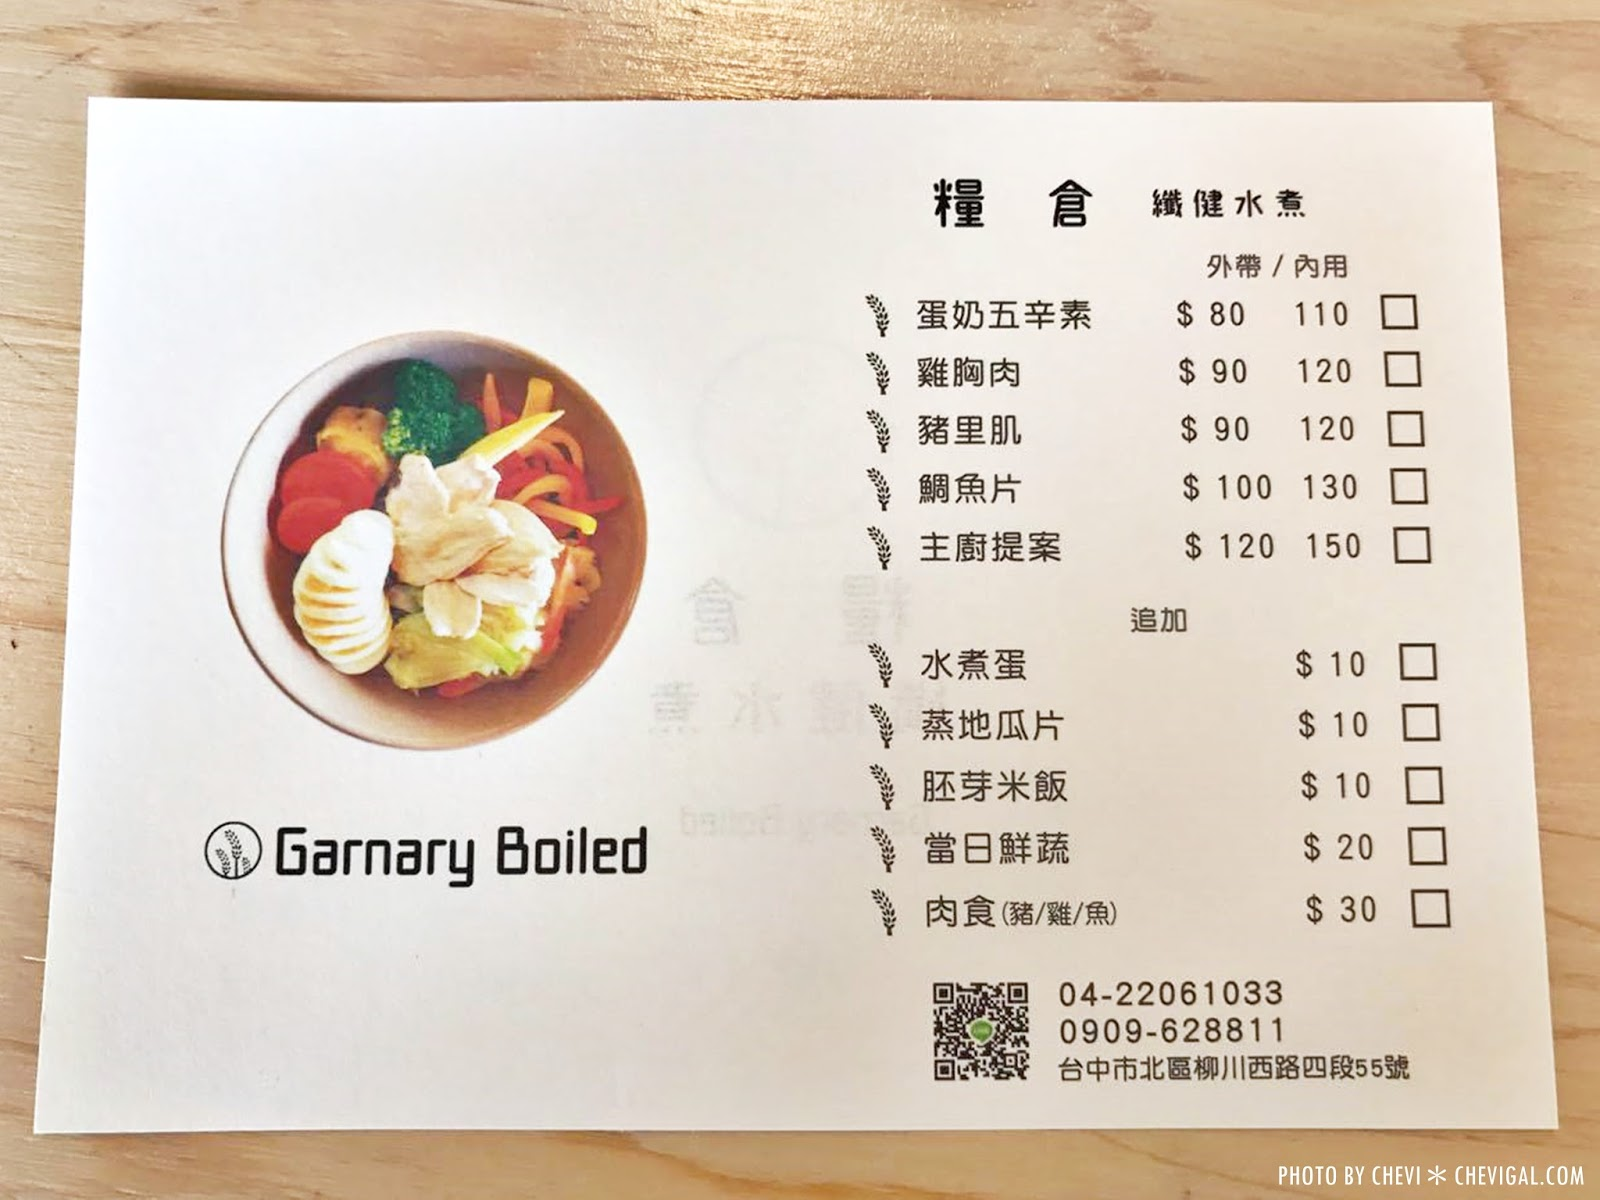 19885722 1519550404772892 268715064 o - 糧倉 纖健水煮,隱身在柳川西路的文青小店。清爽水煮料理讓你吃到鮮甜原味